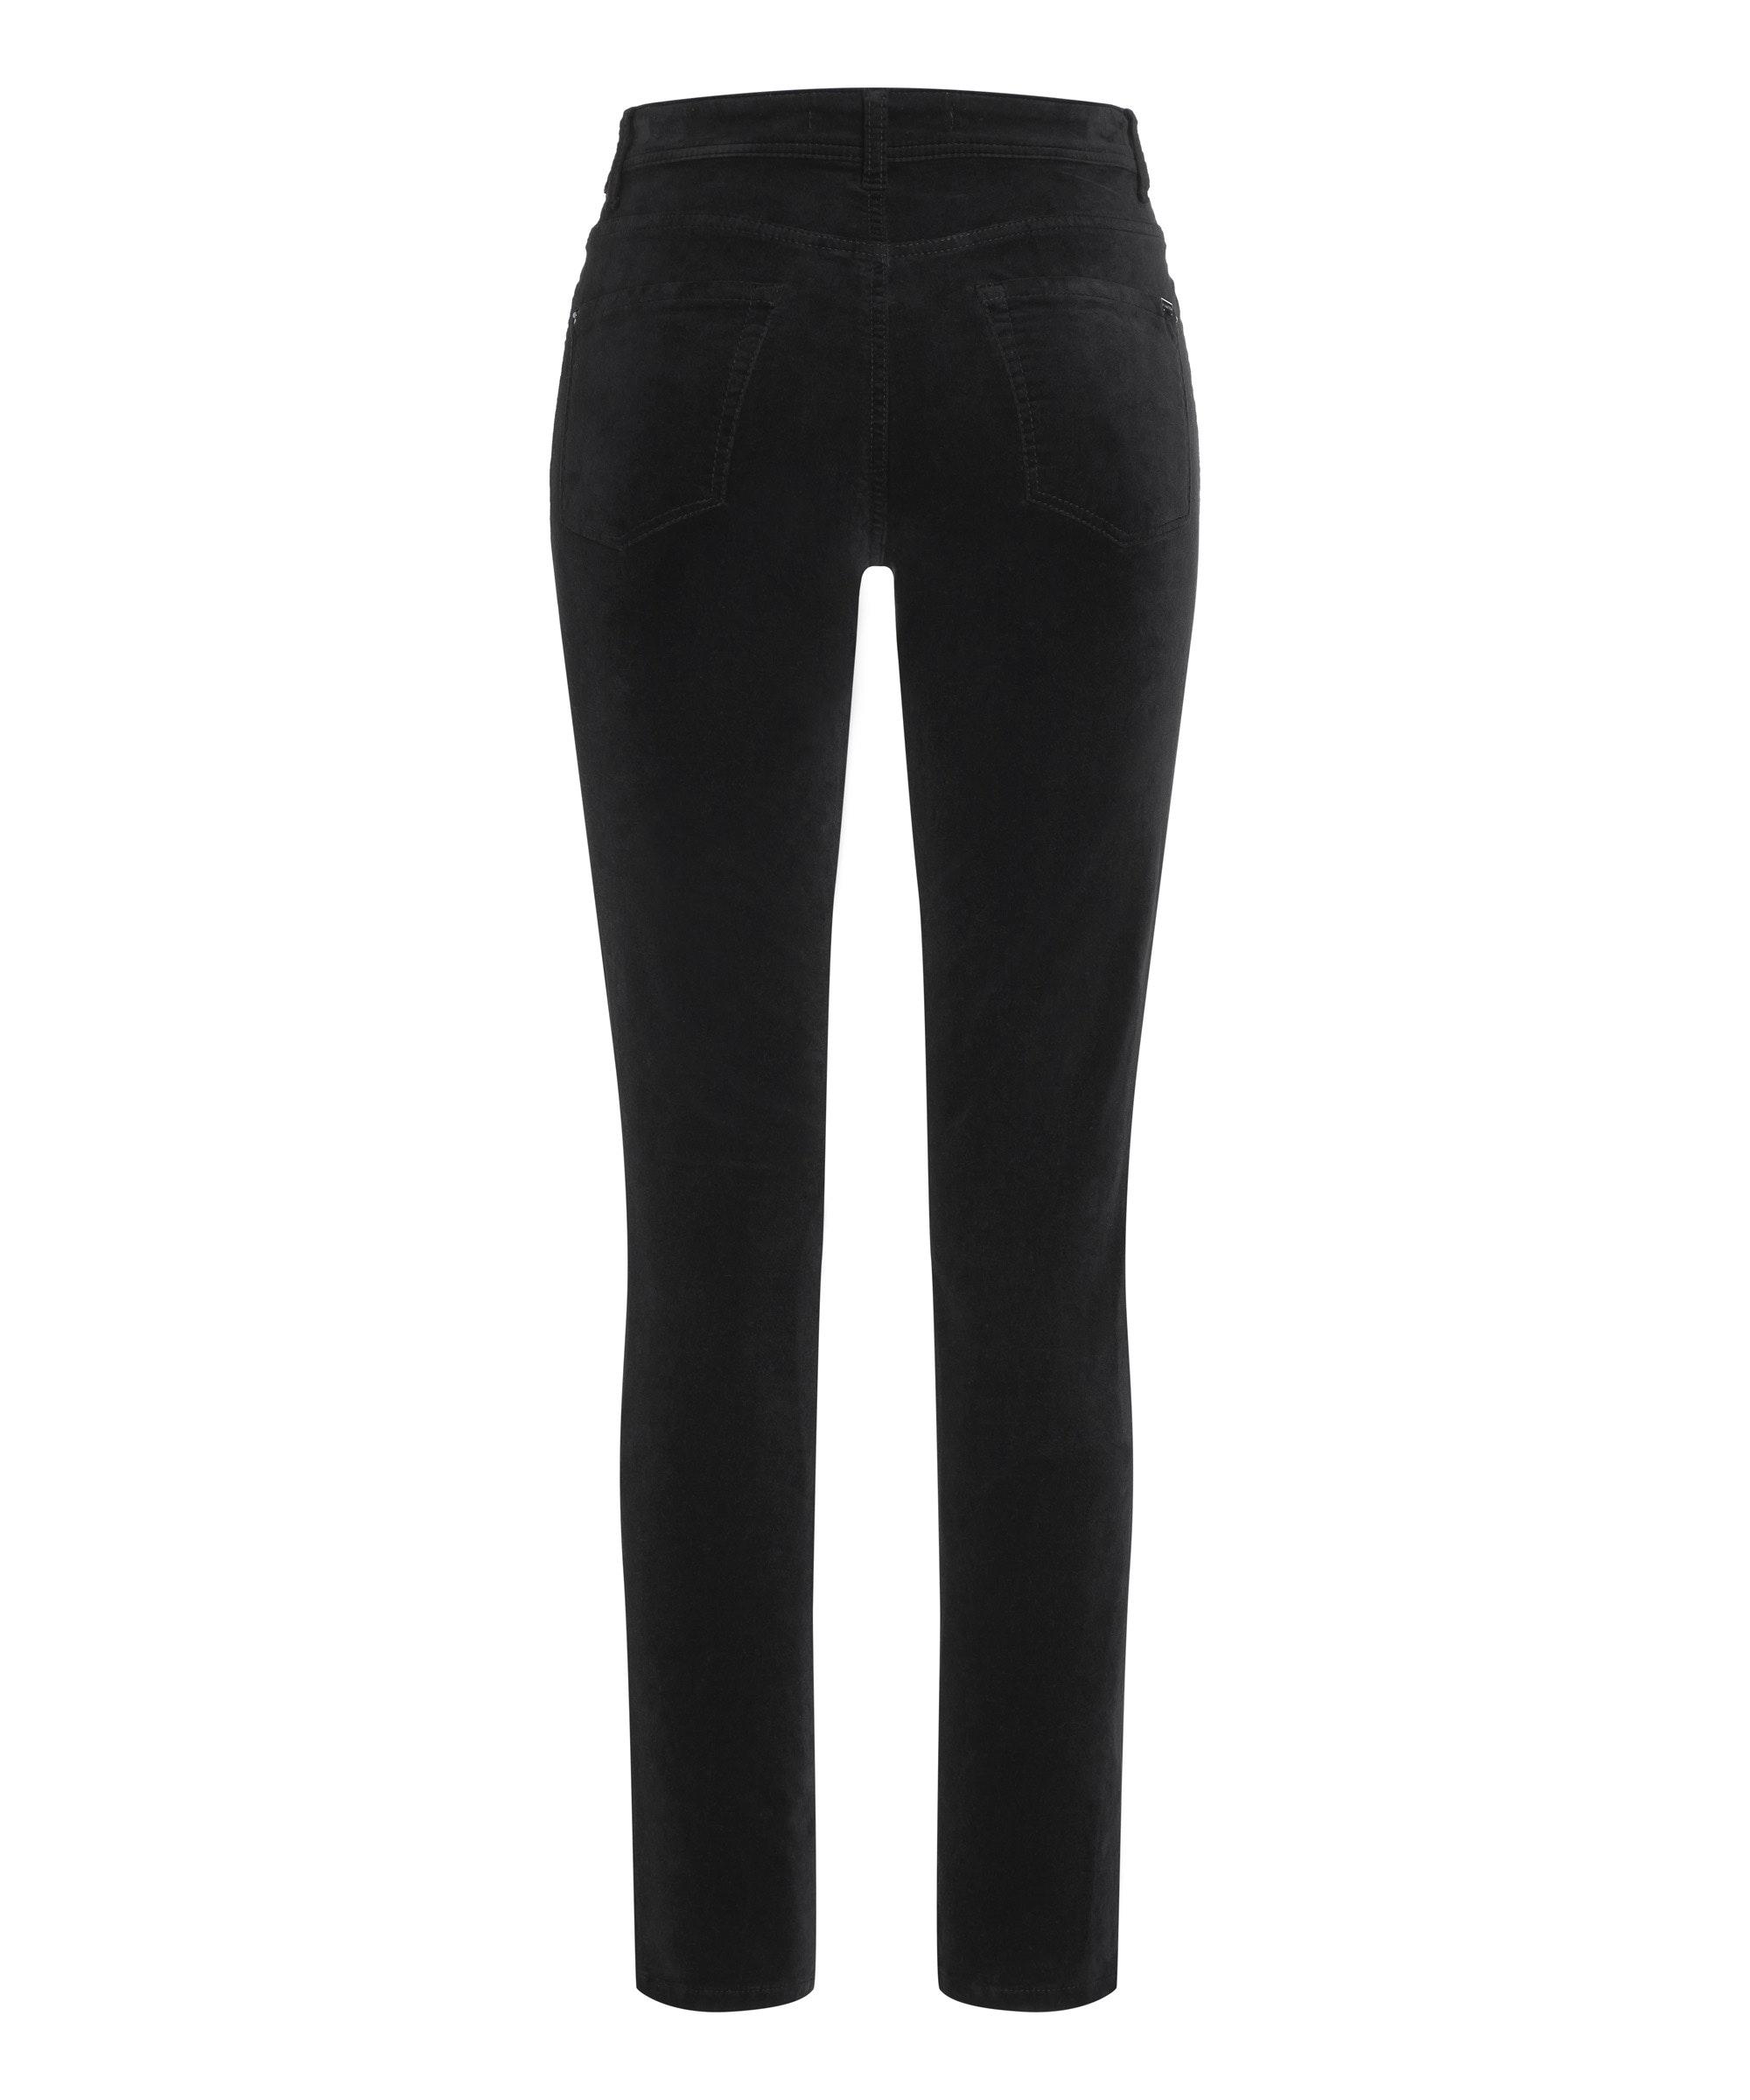 Cambio Jeans Parla LUXURY BLACK